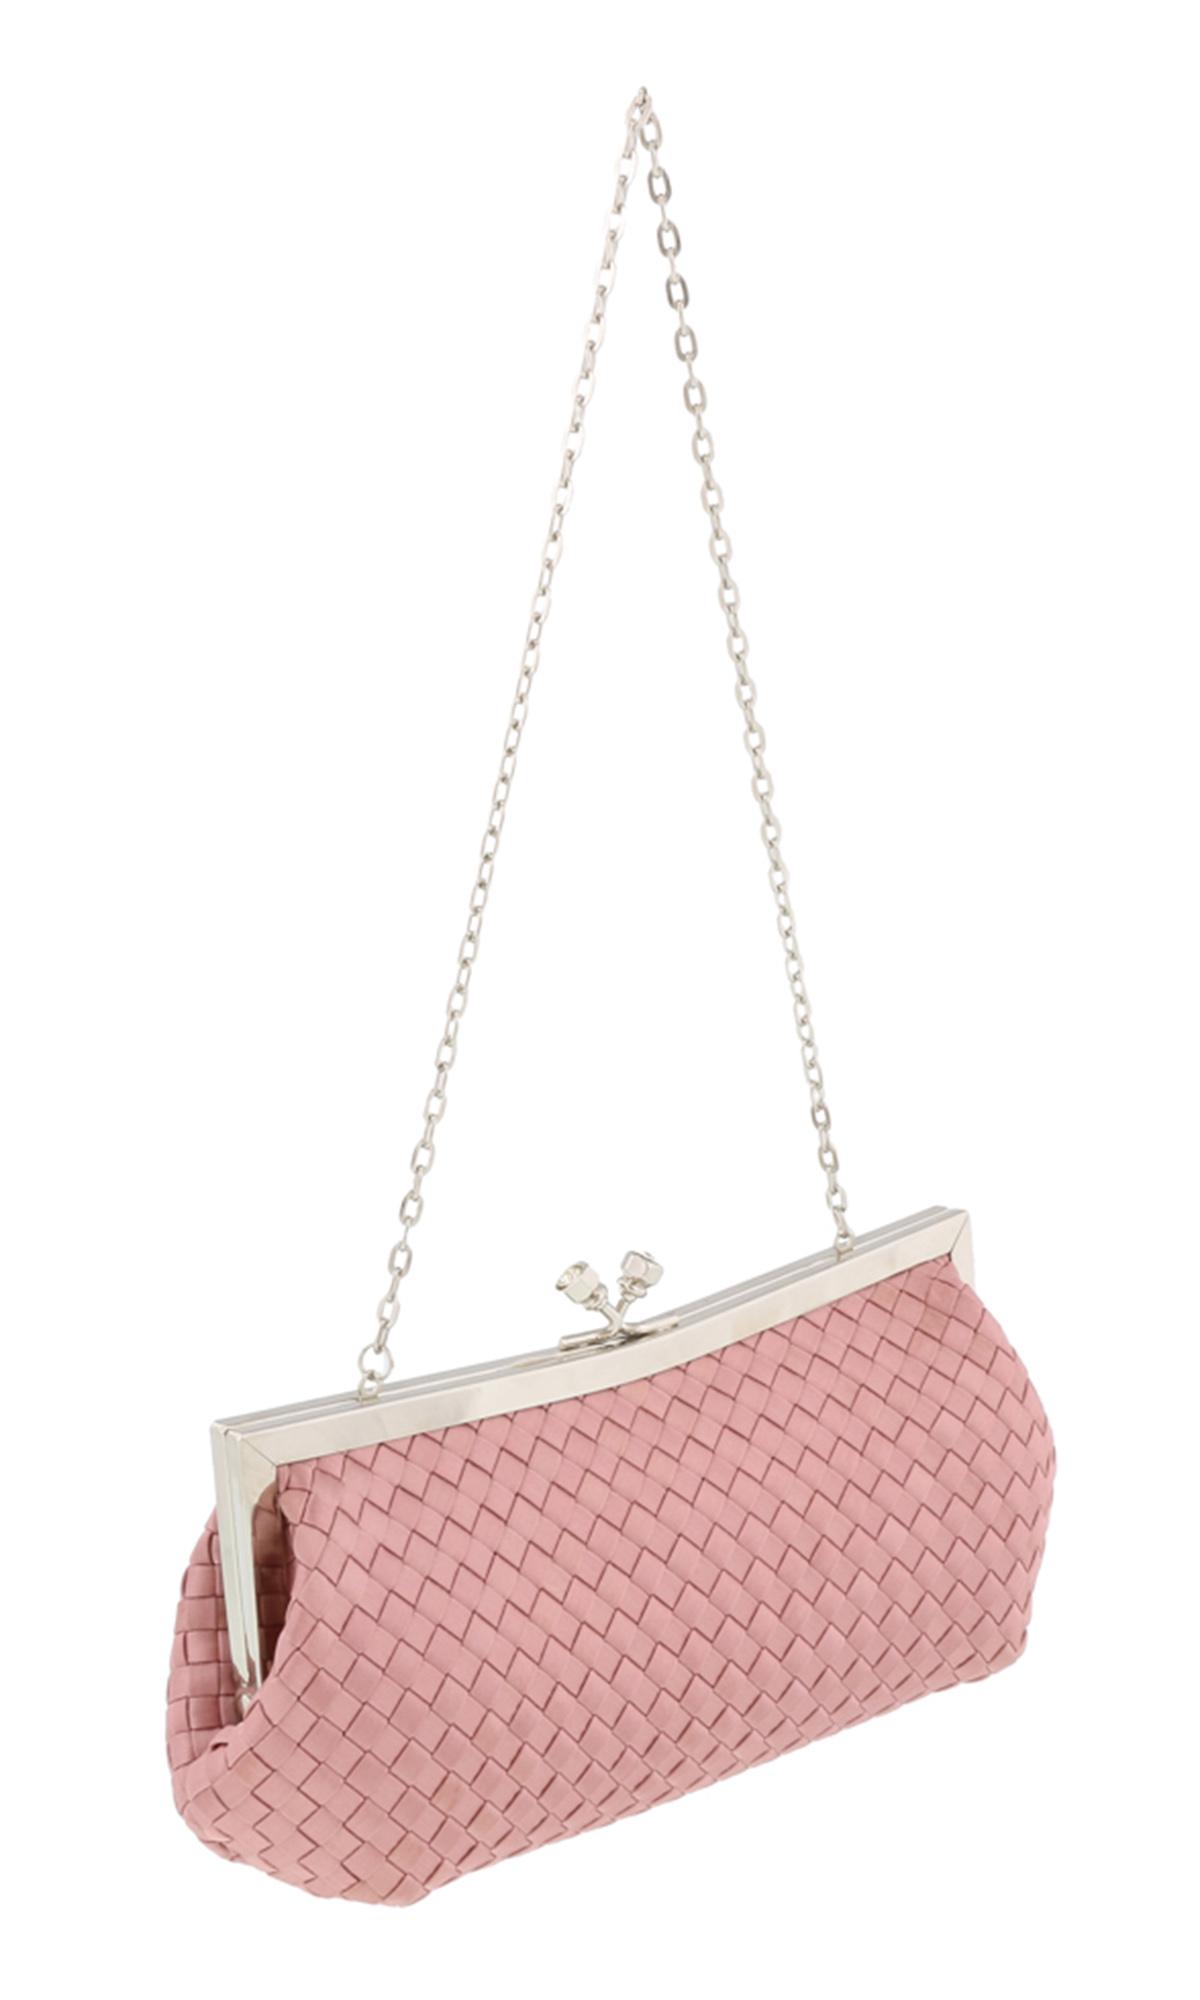 Scheilan  Rose Fabric Weave Knot Clutch/Shoulder Bag